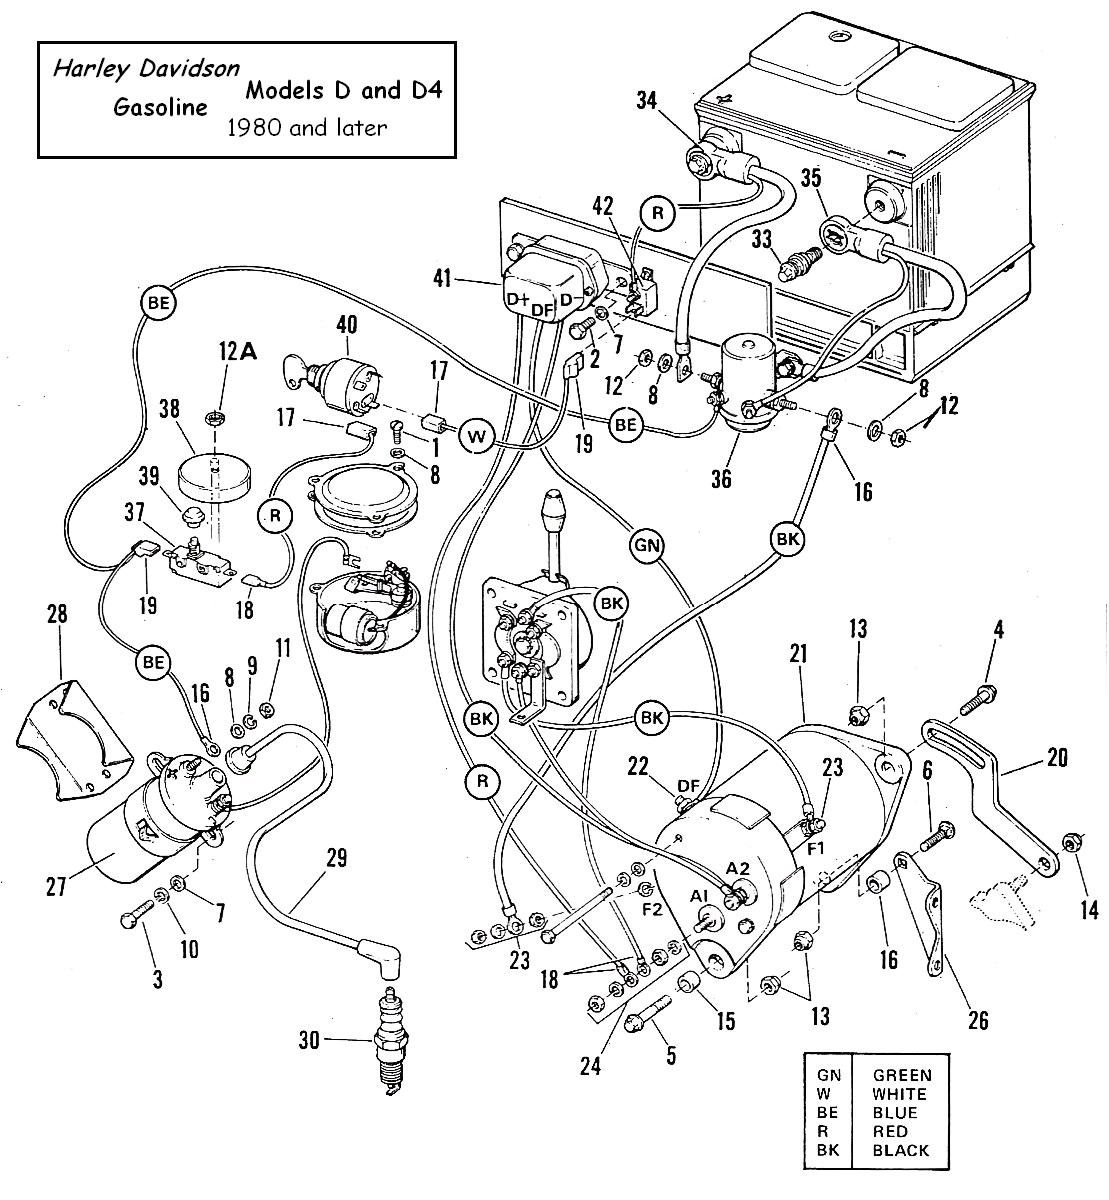 1976 harley davidson golf cart wiring diagram best wiring diagram jpg